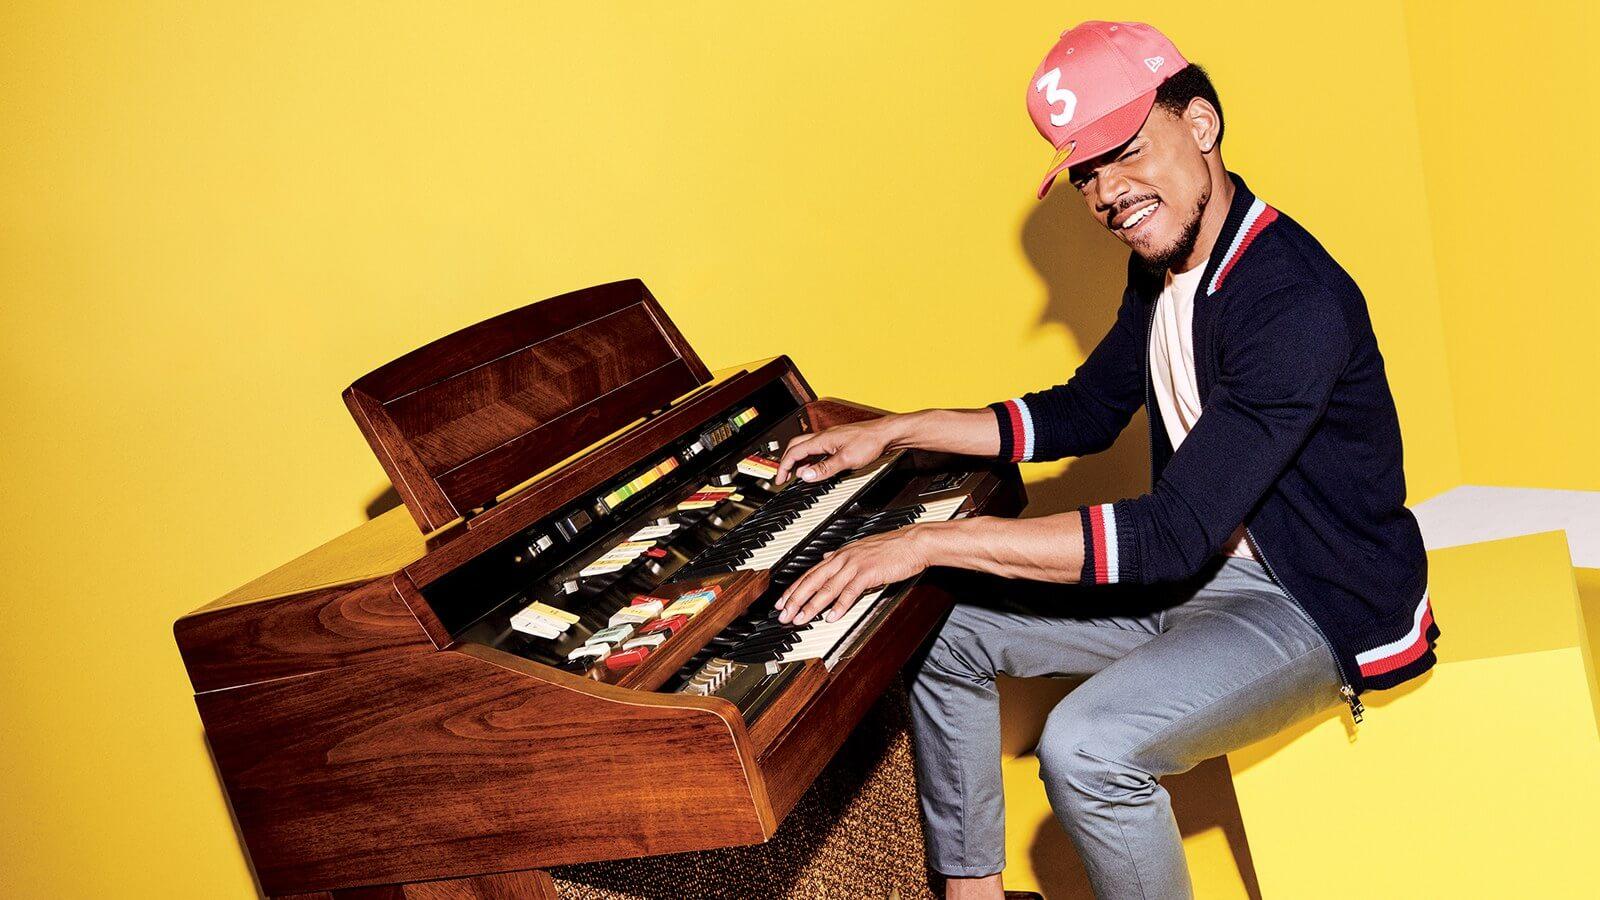 Chance The Rapper. Fotografía: Eric ray Davidson/GQ